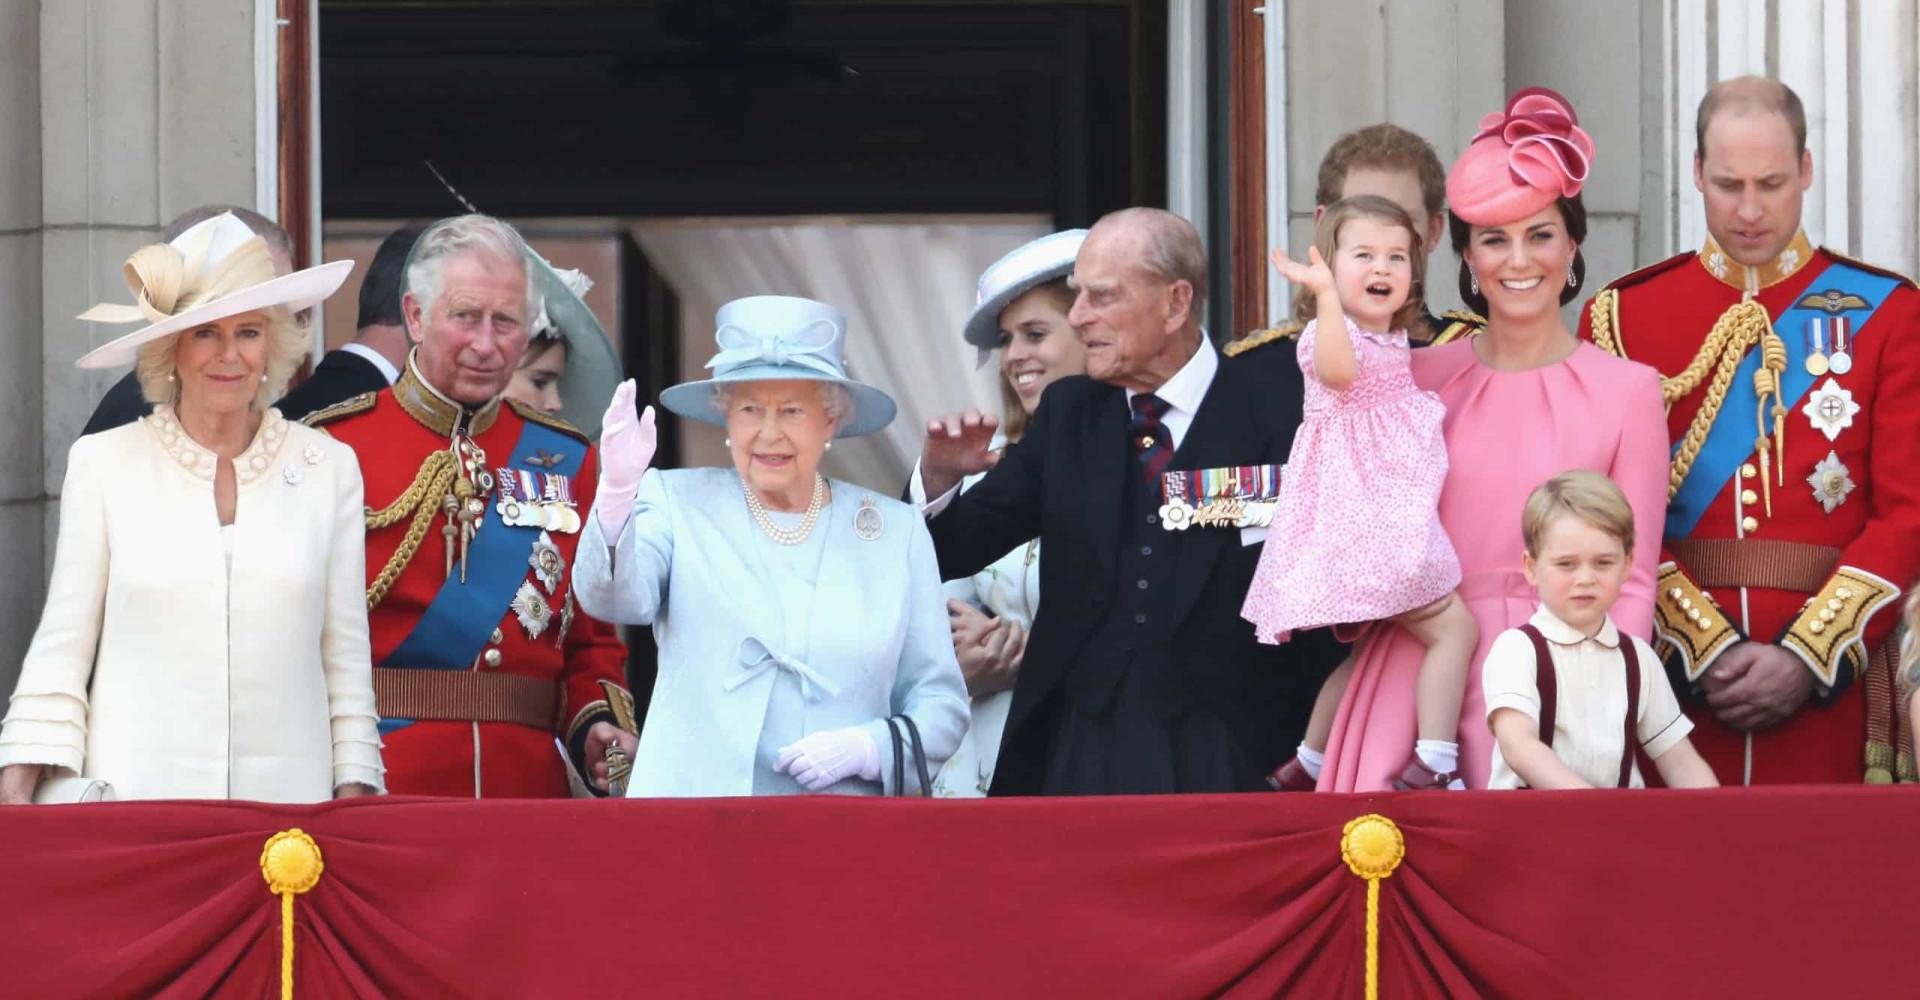 The British Royal Family's dress code